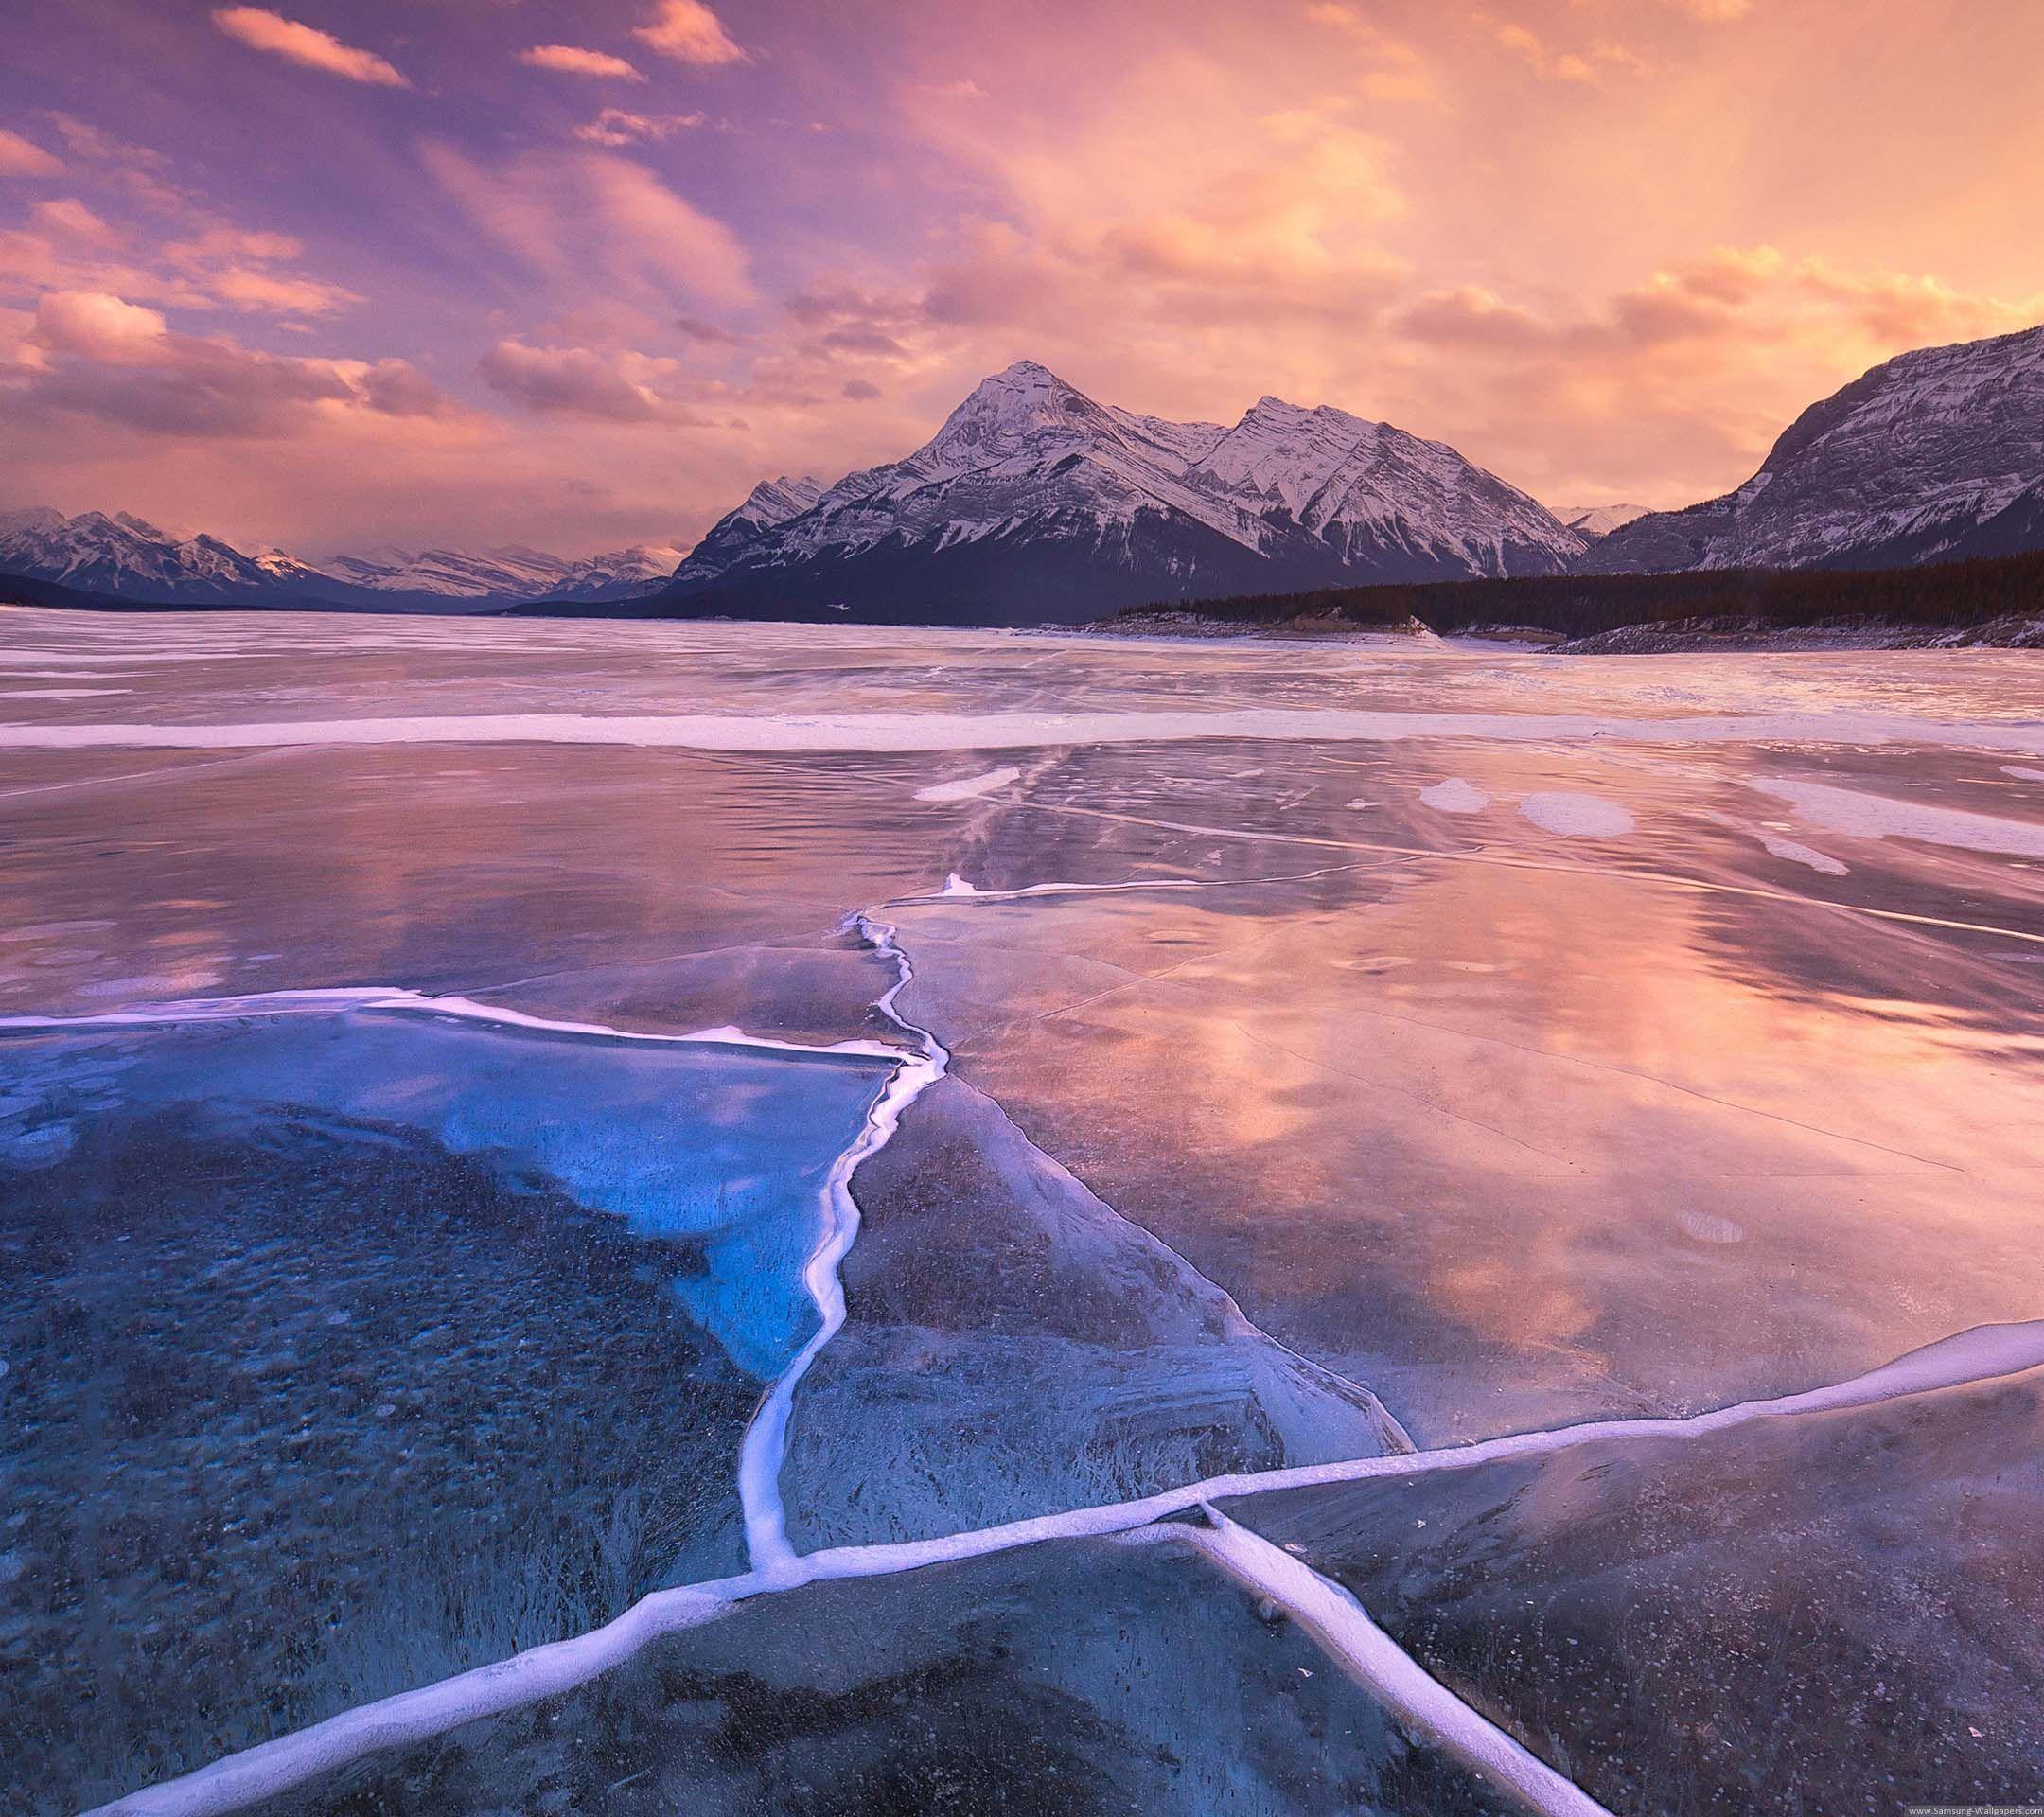 Lake Sunset Lock Screen 2160x1920 Samsung Galaxy Note 3